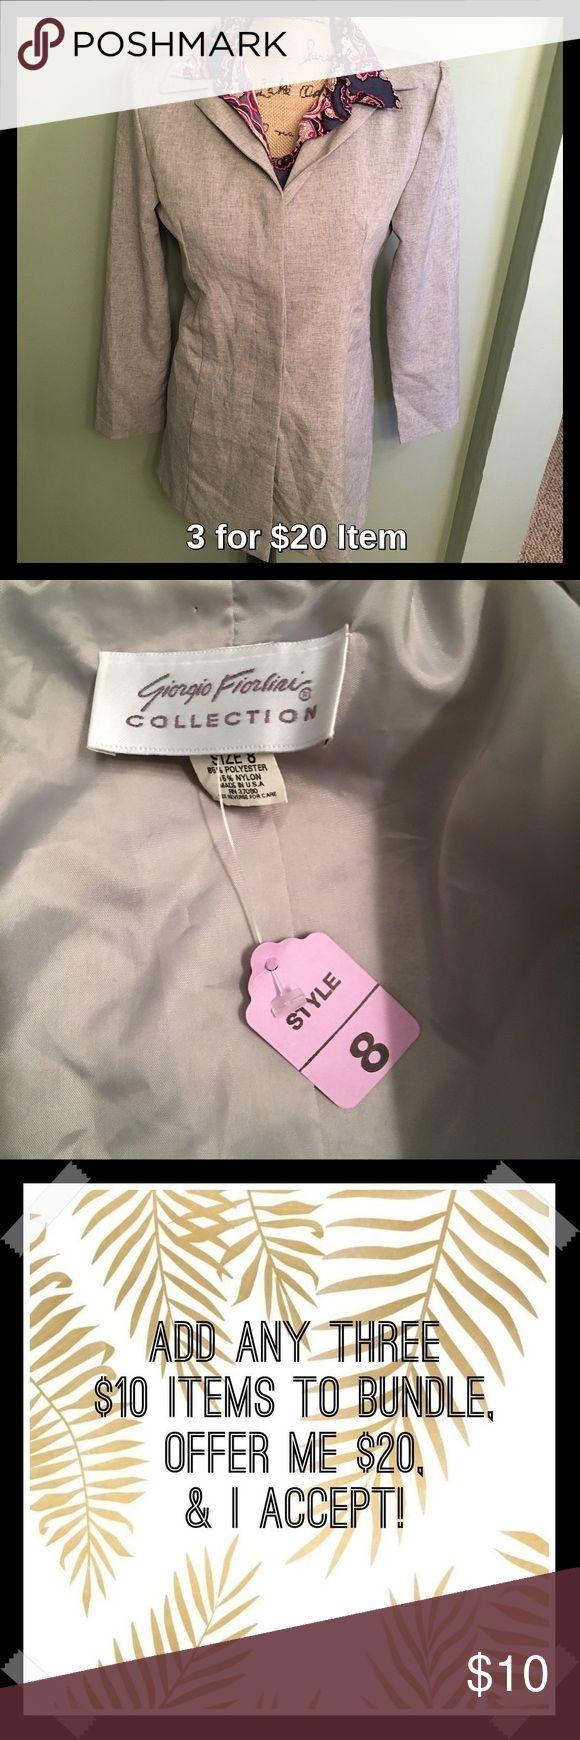 GF Grey Blazer Sale! Price is firm unless 3 for $20 bundled. Button closure Blazer. Great for work! Jackets & Coats Blazers